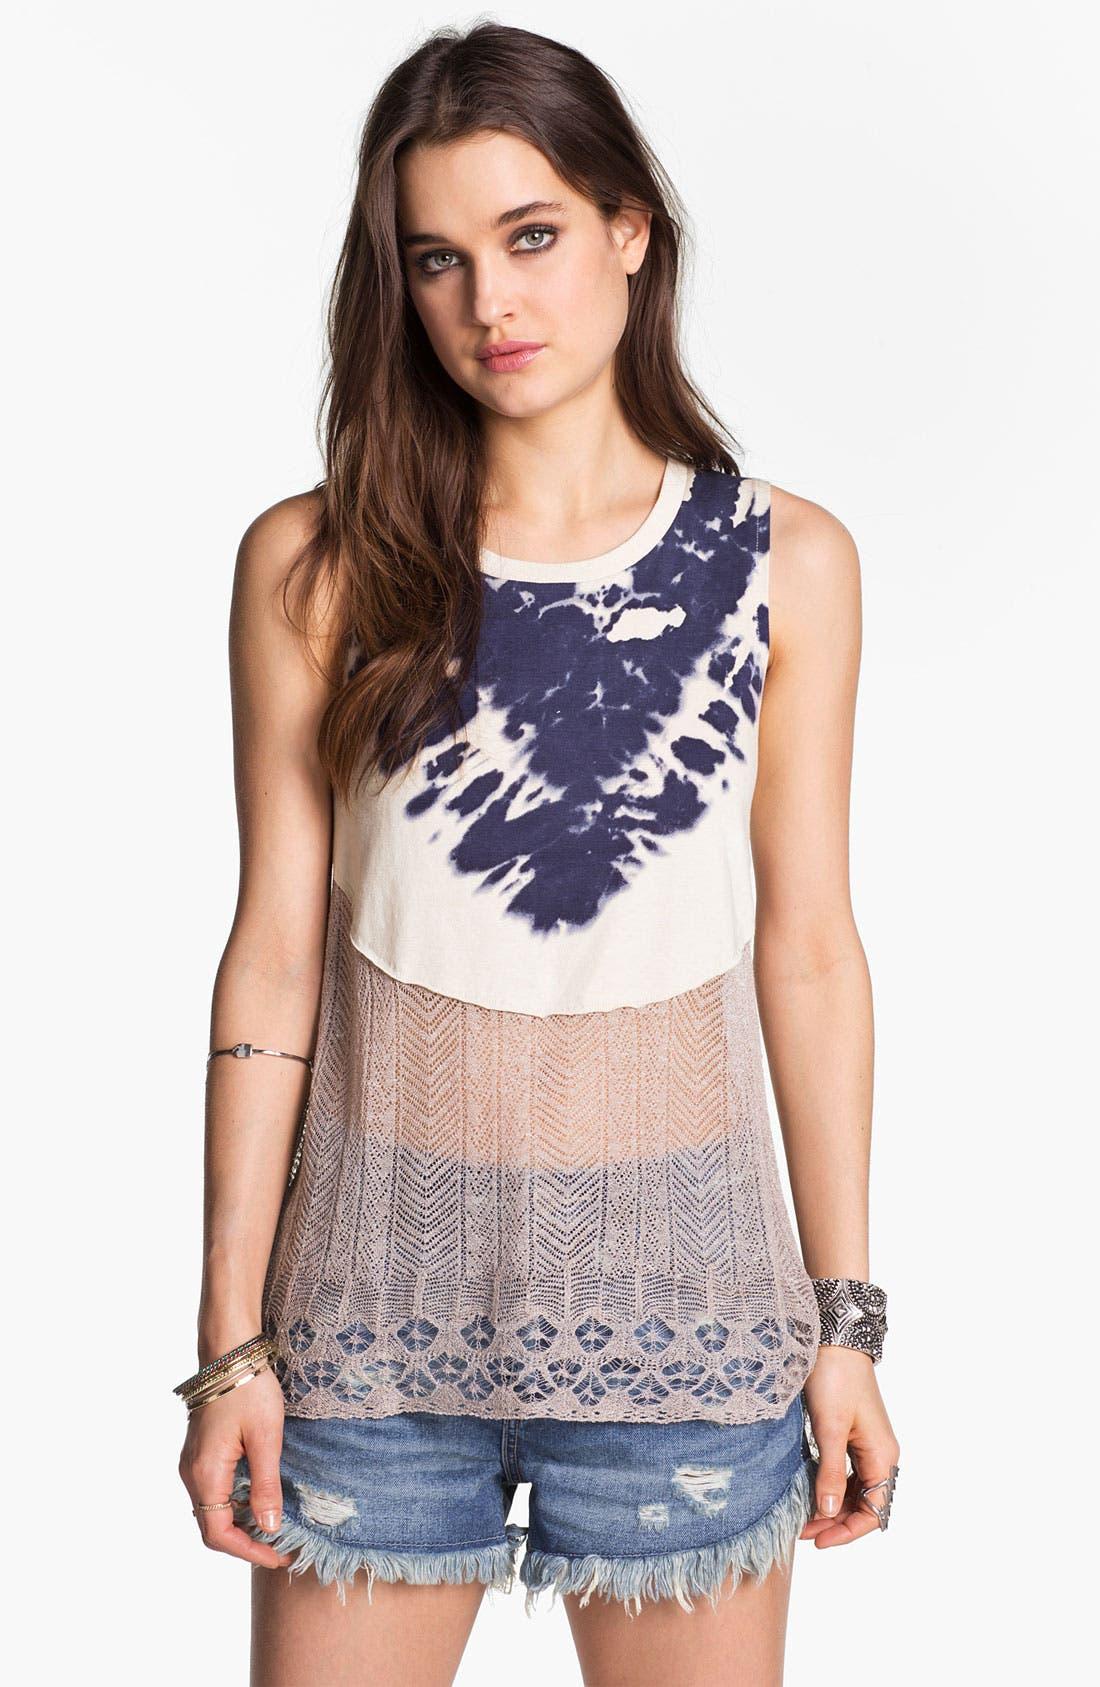 Main Image - Free People 'Bonnaroo' Tie Dye & Crochet Tank